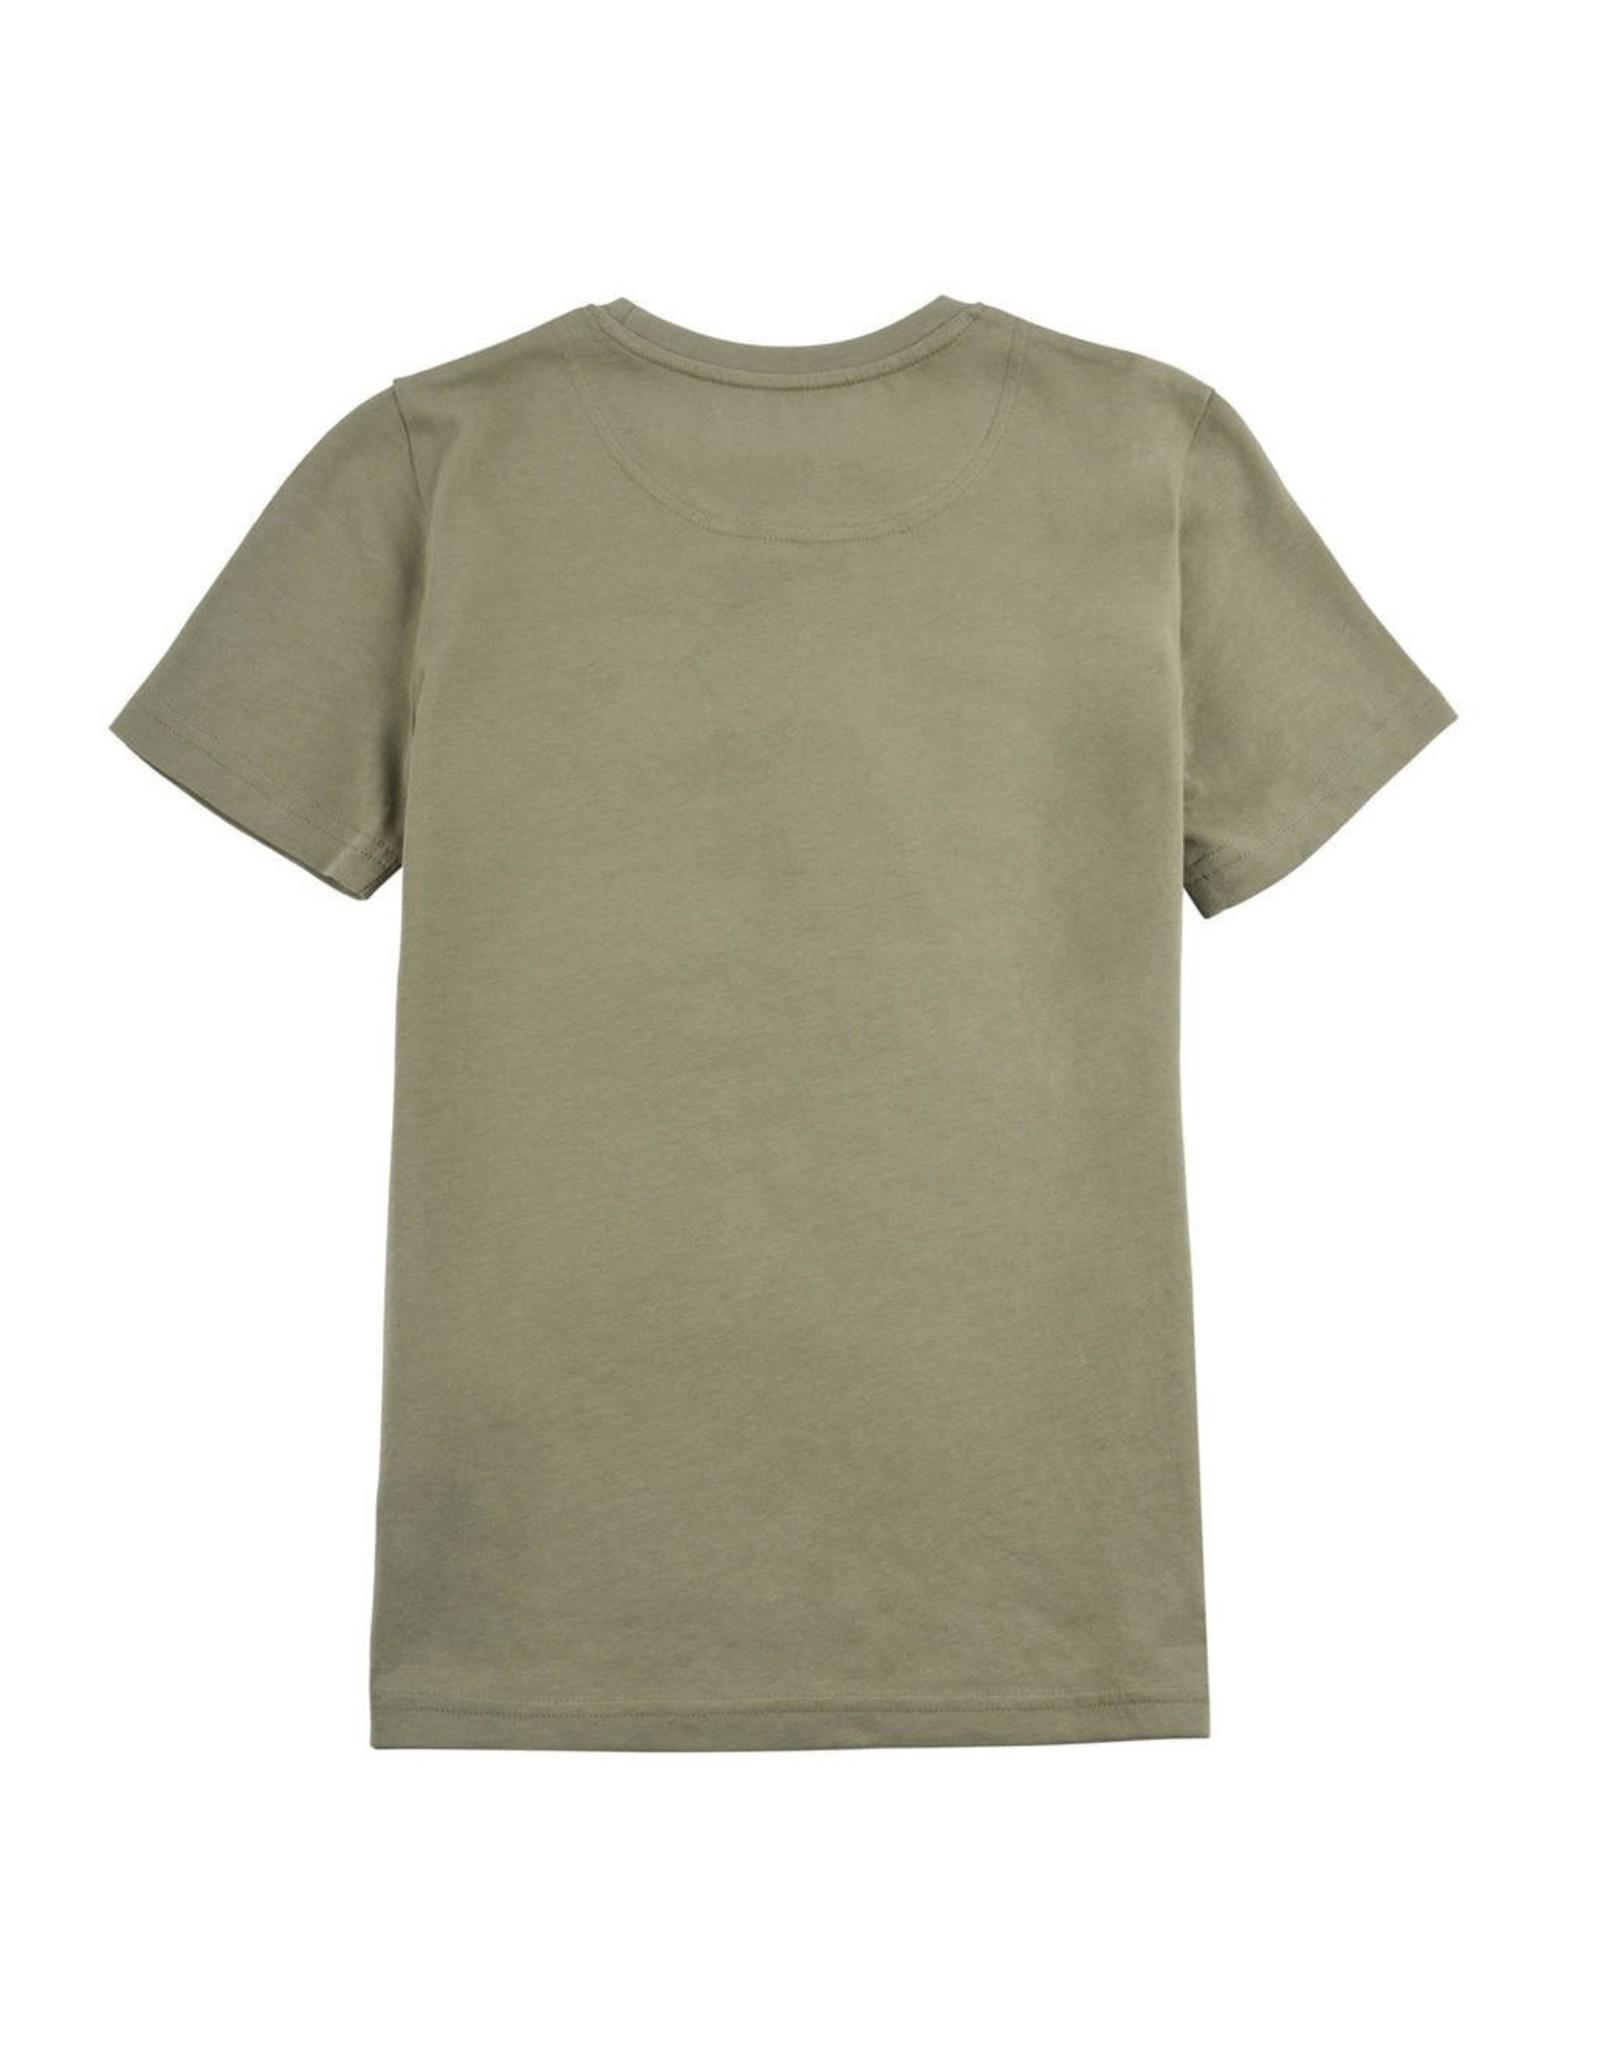 Lyle & Scott Boys Classic T Shirt Oil Green